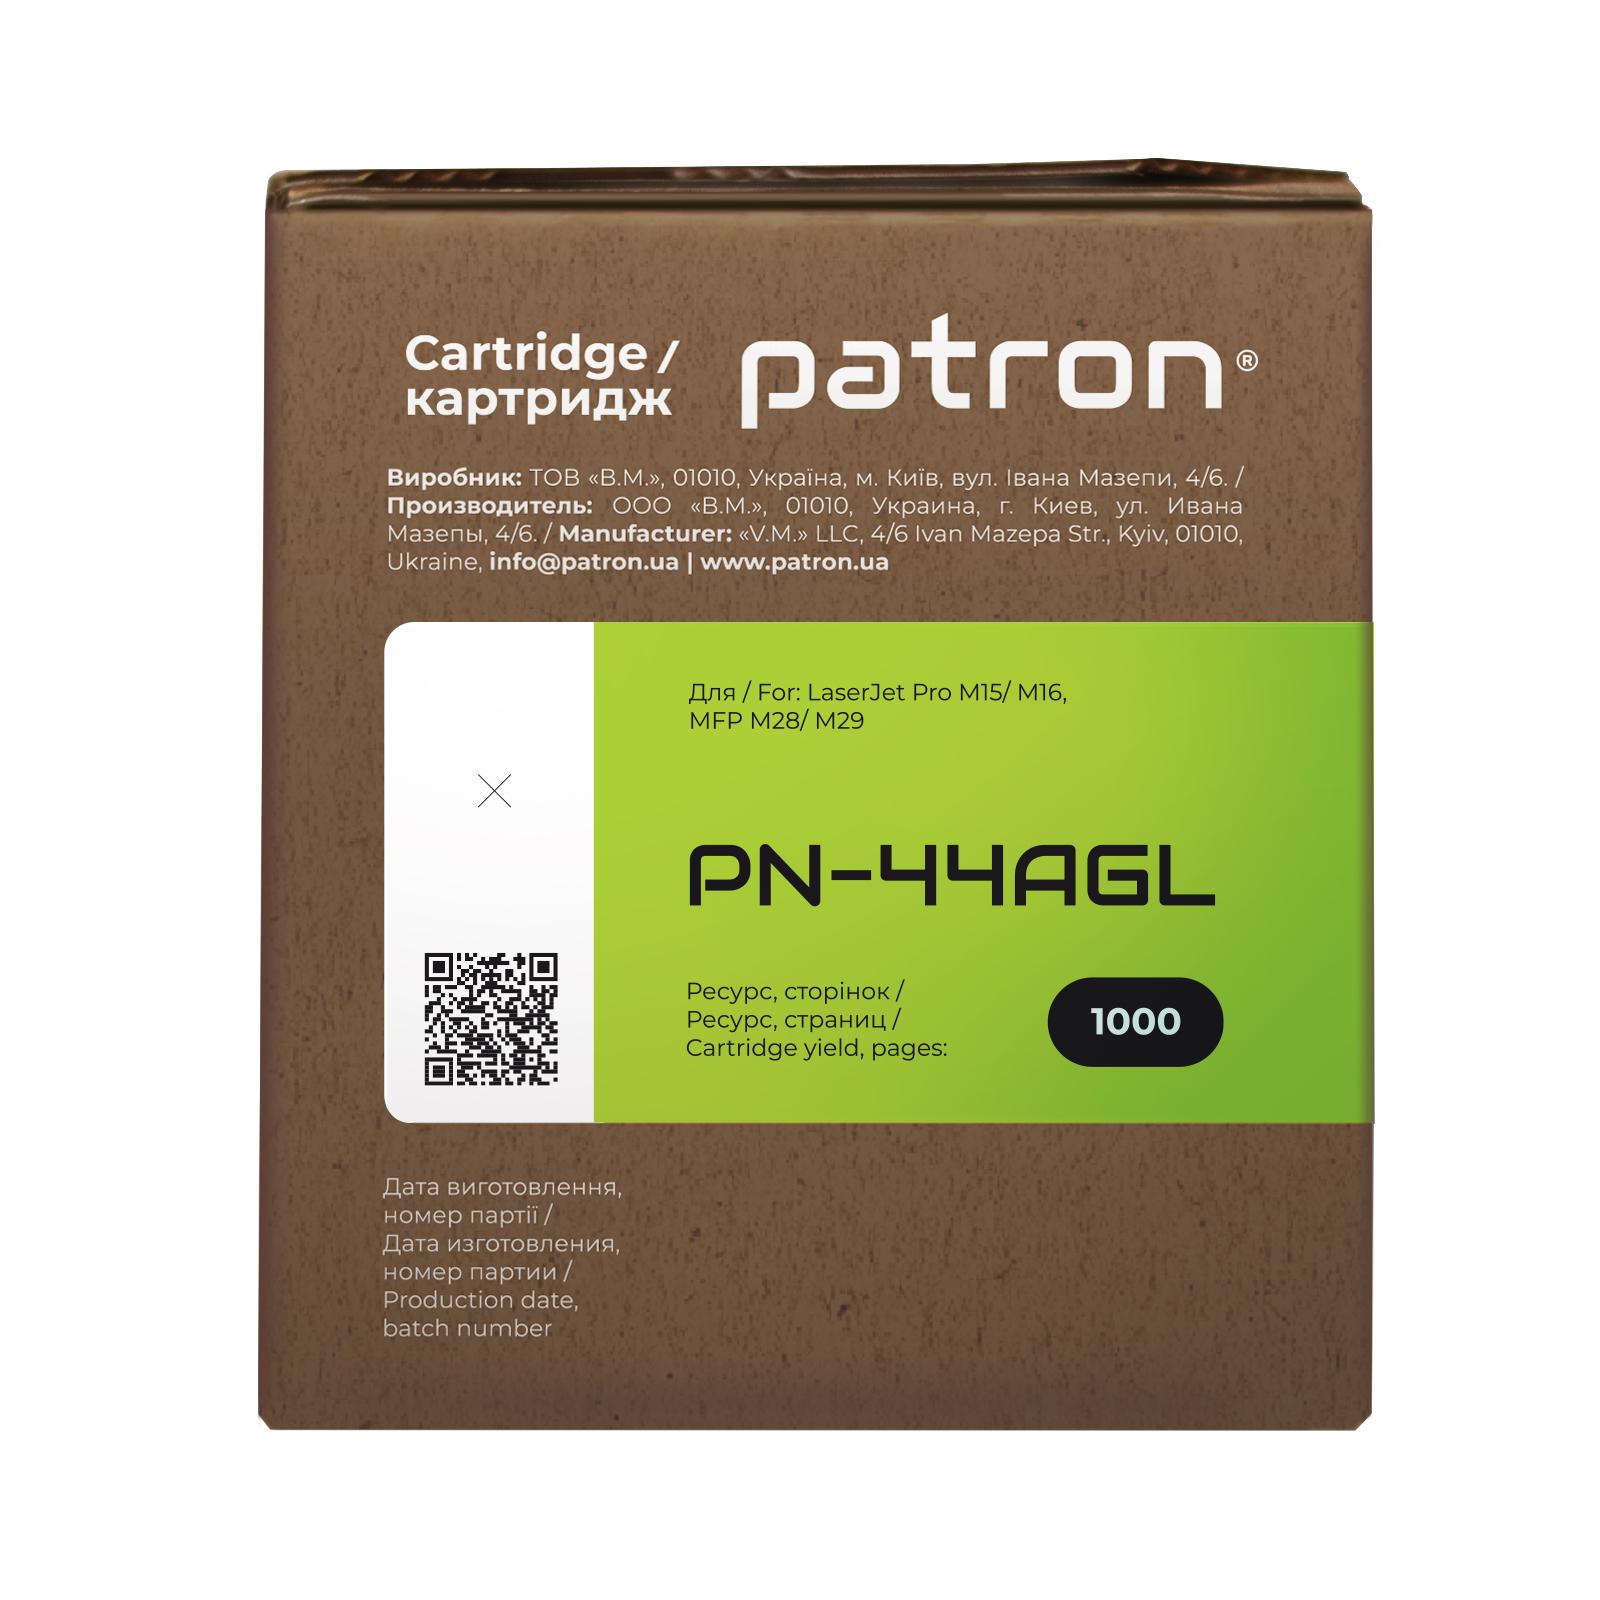 Картридж Patron HP LJ CF244A GREEN Label (PN-44AGL) изображение 3